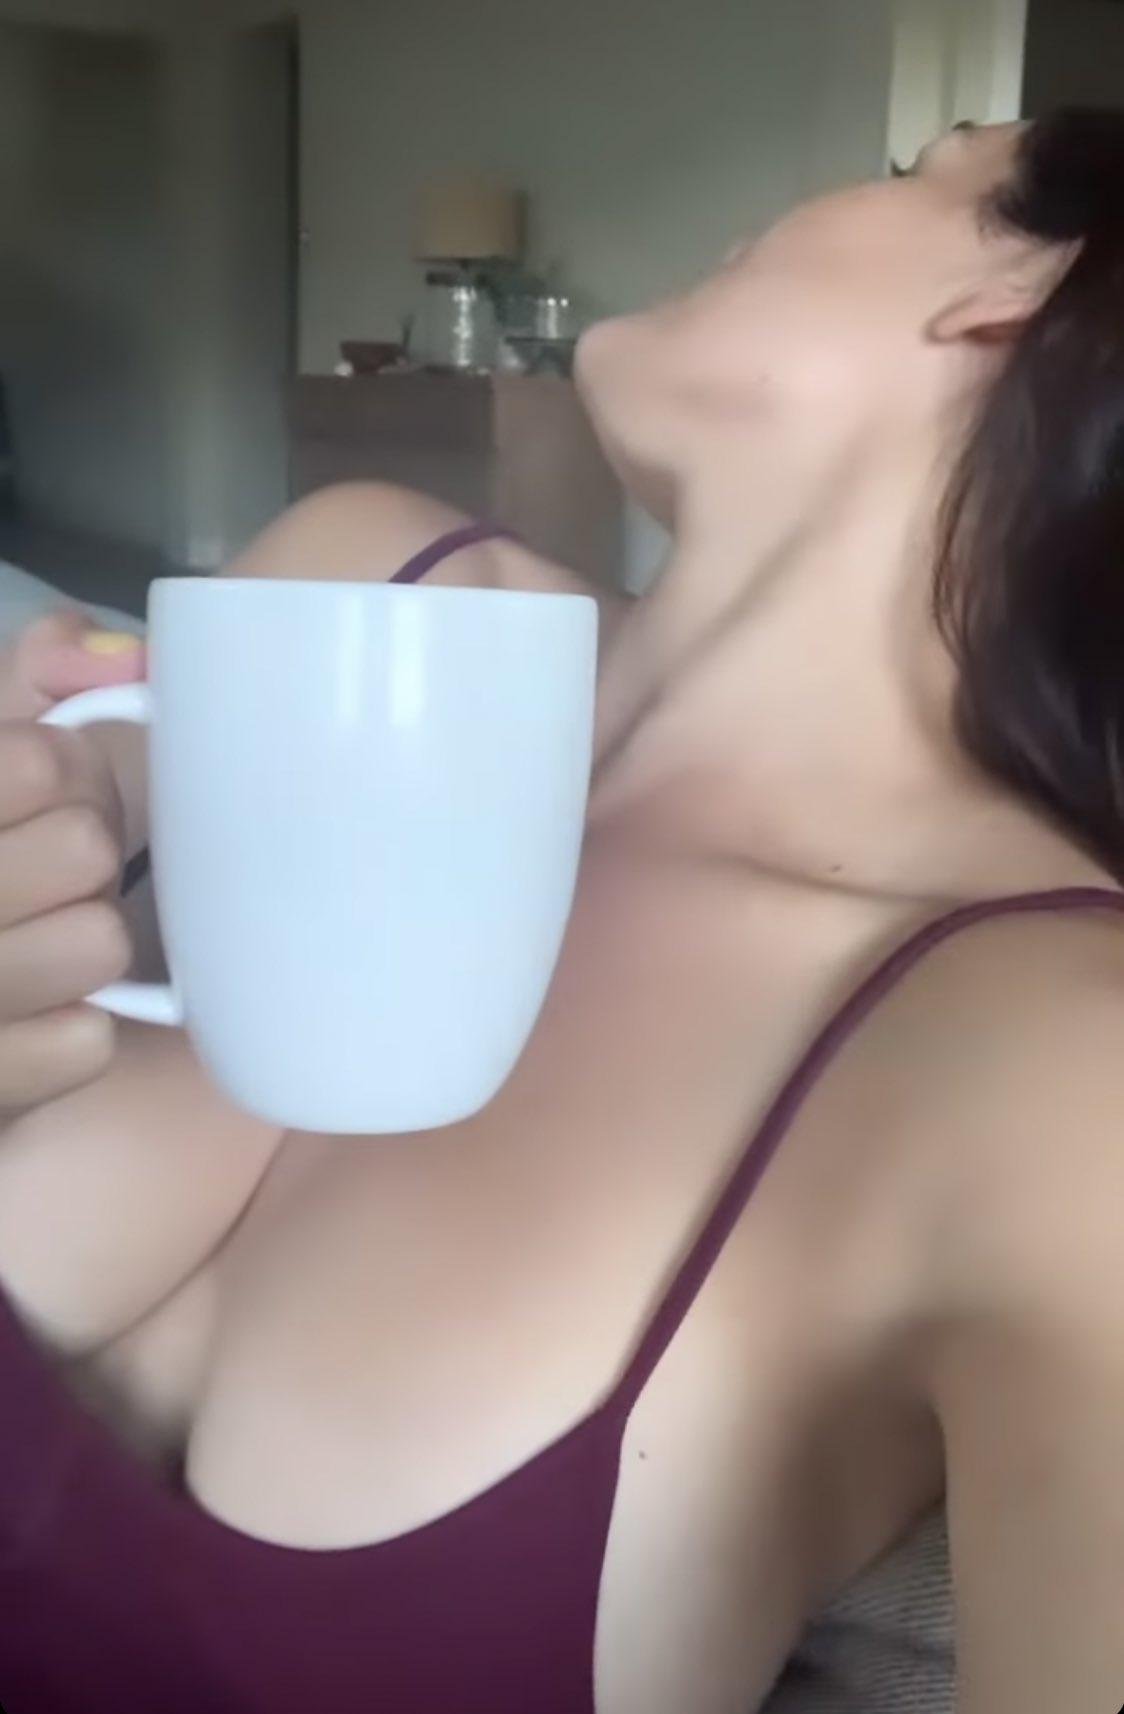 WWE Star Nikki Bella Shares Intimate Videos With Fiancée Artem 2